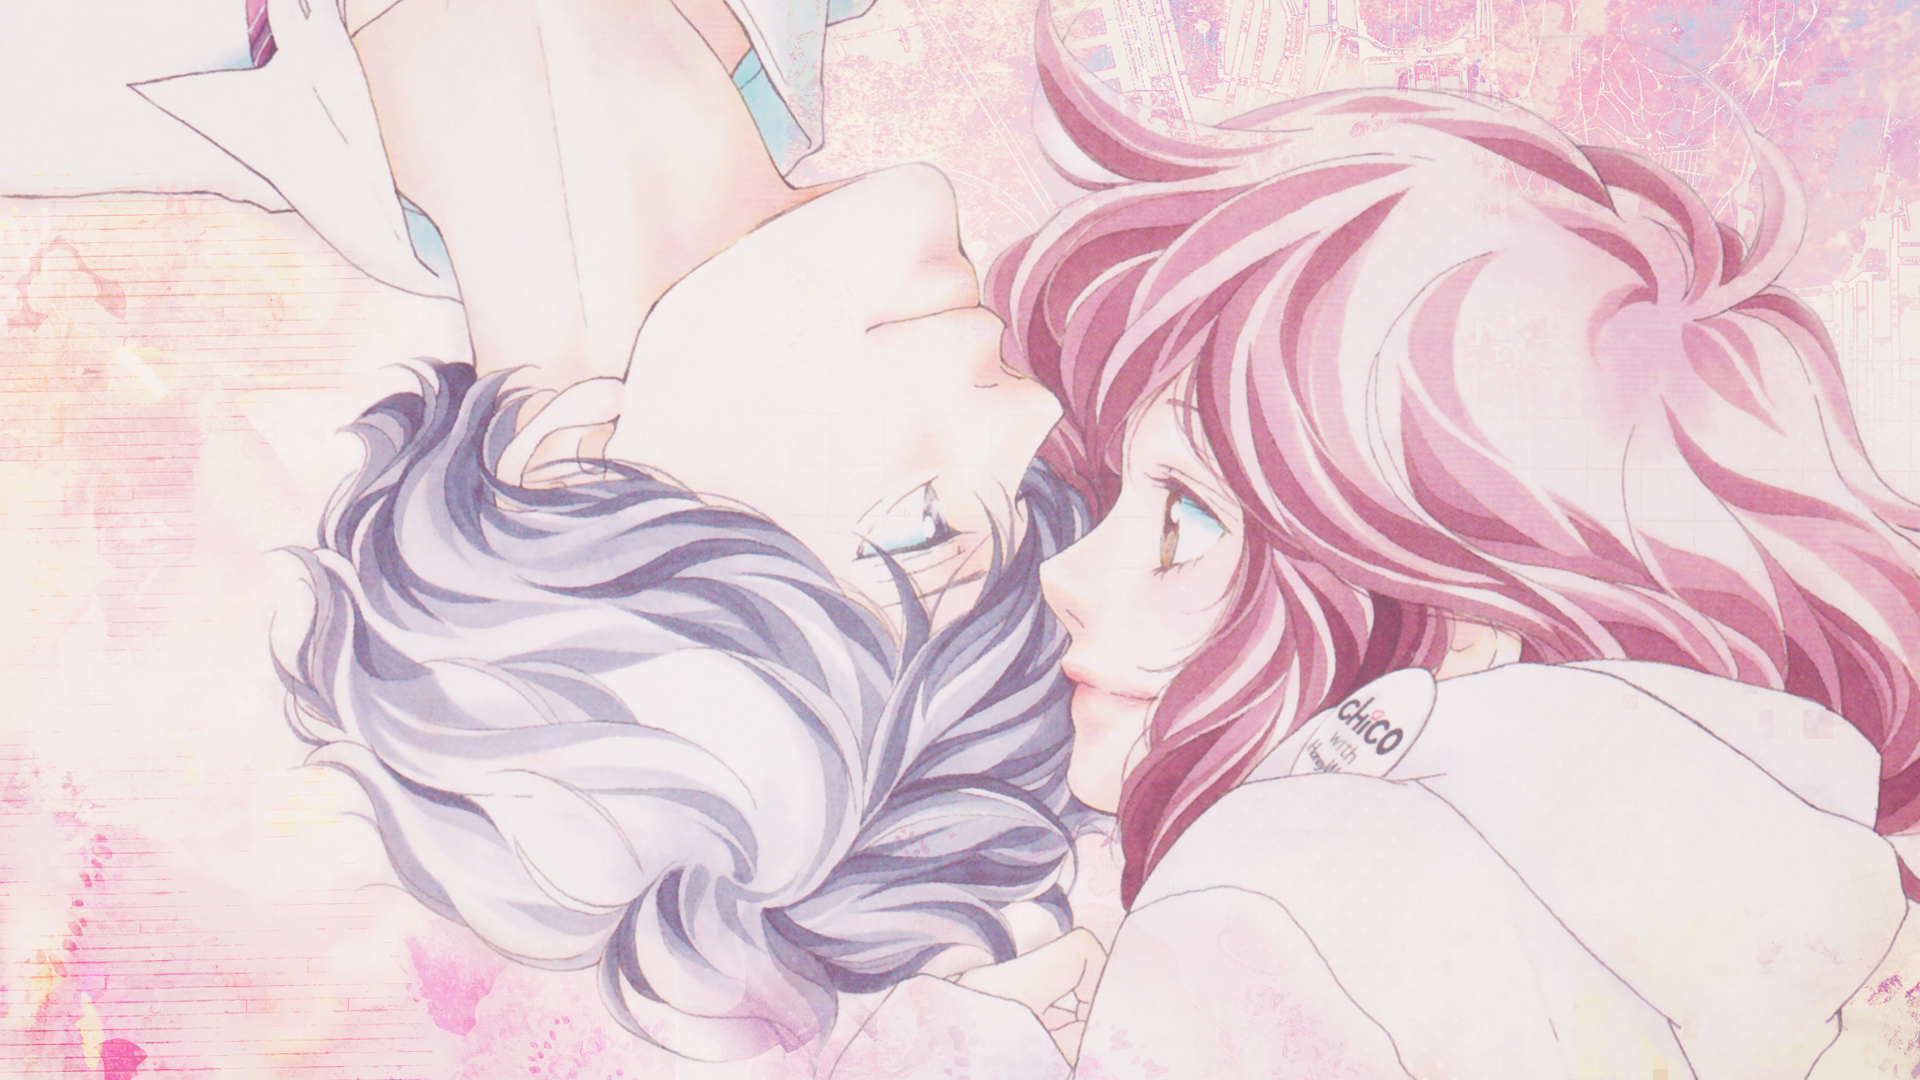 Ao Haru Ride Blue Spring Ride Wallpaper 2480802 Zerochan Anime Image Board